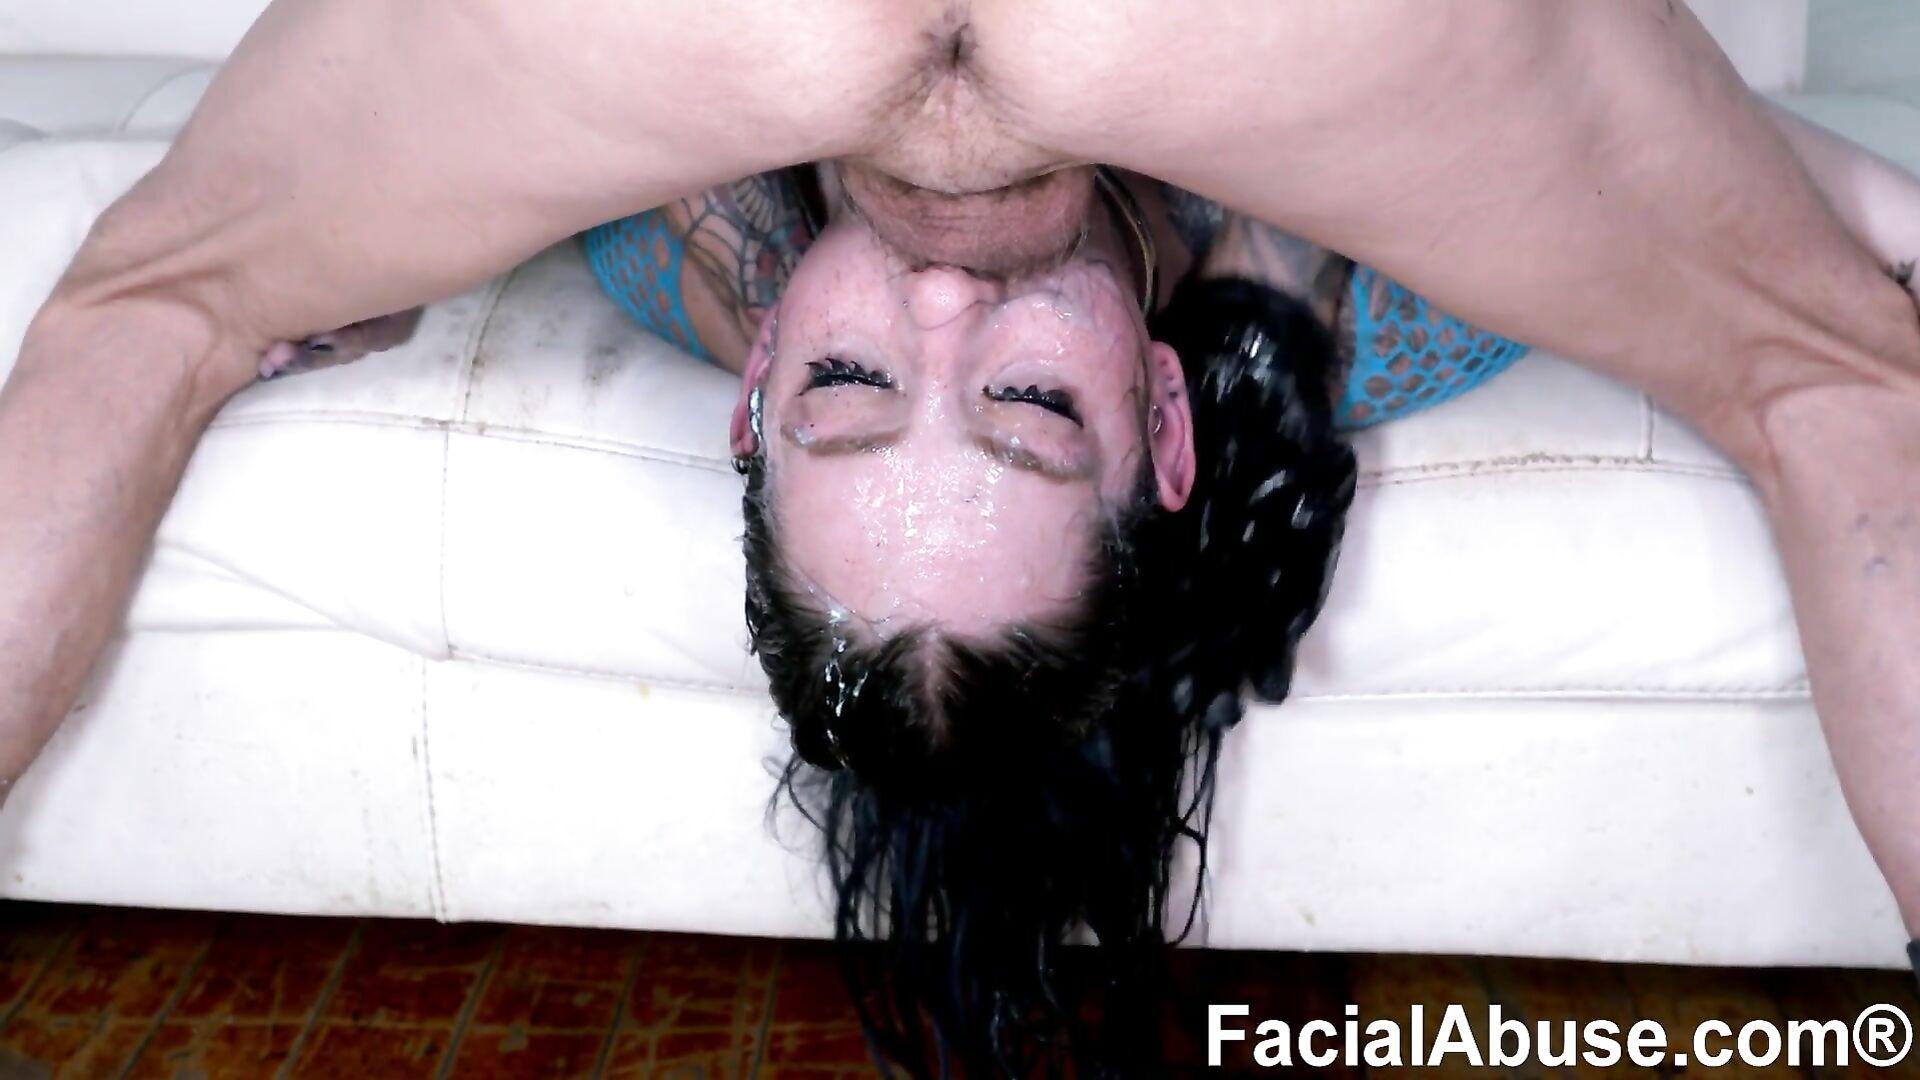 FacialAbuse